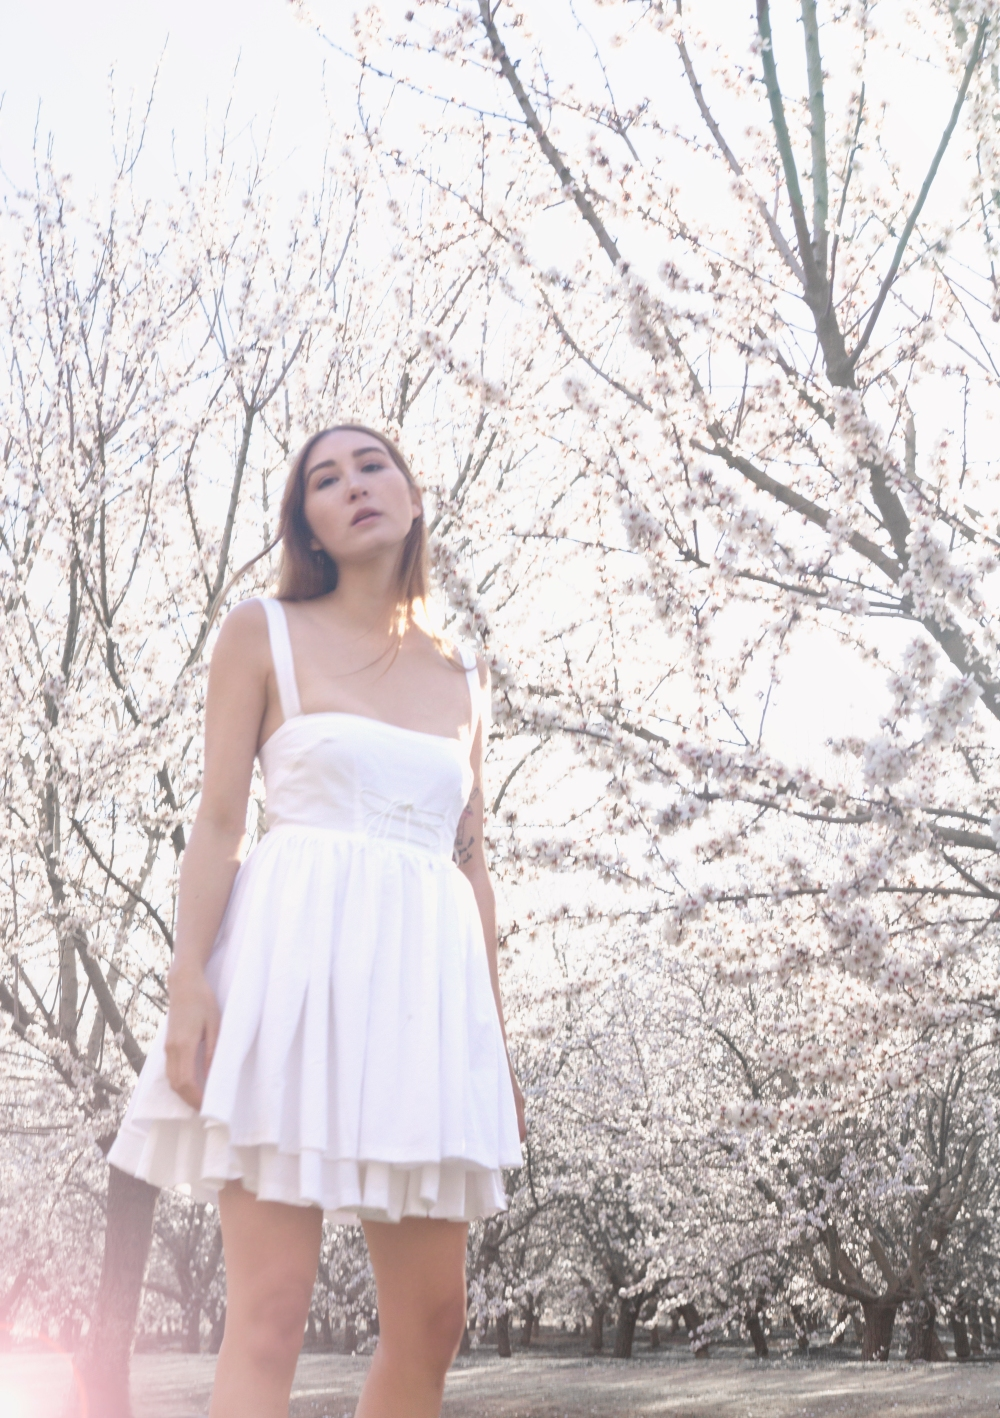 Alyssa_Nicole_Spring_2018_Blossom_4820 copy